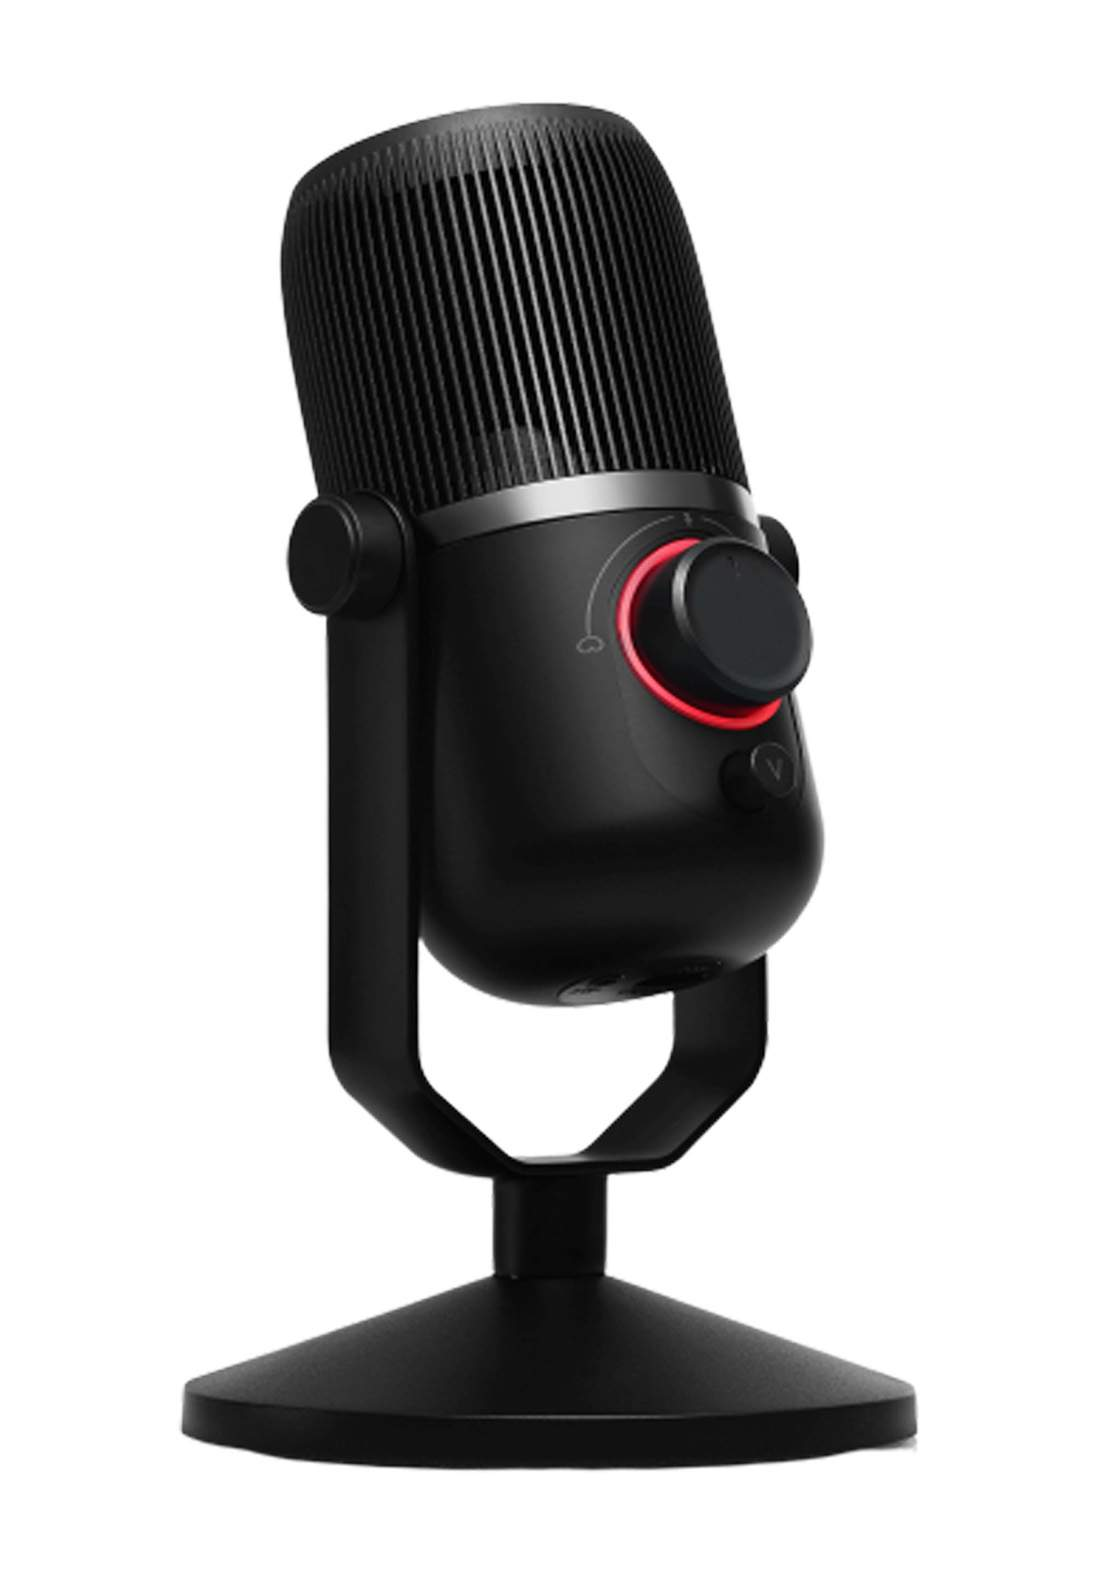 Thronmax Mdrill Zero USB Microphone - Black مايكروفون